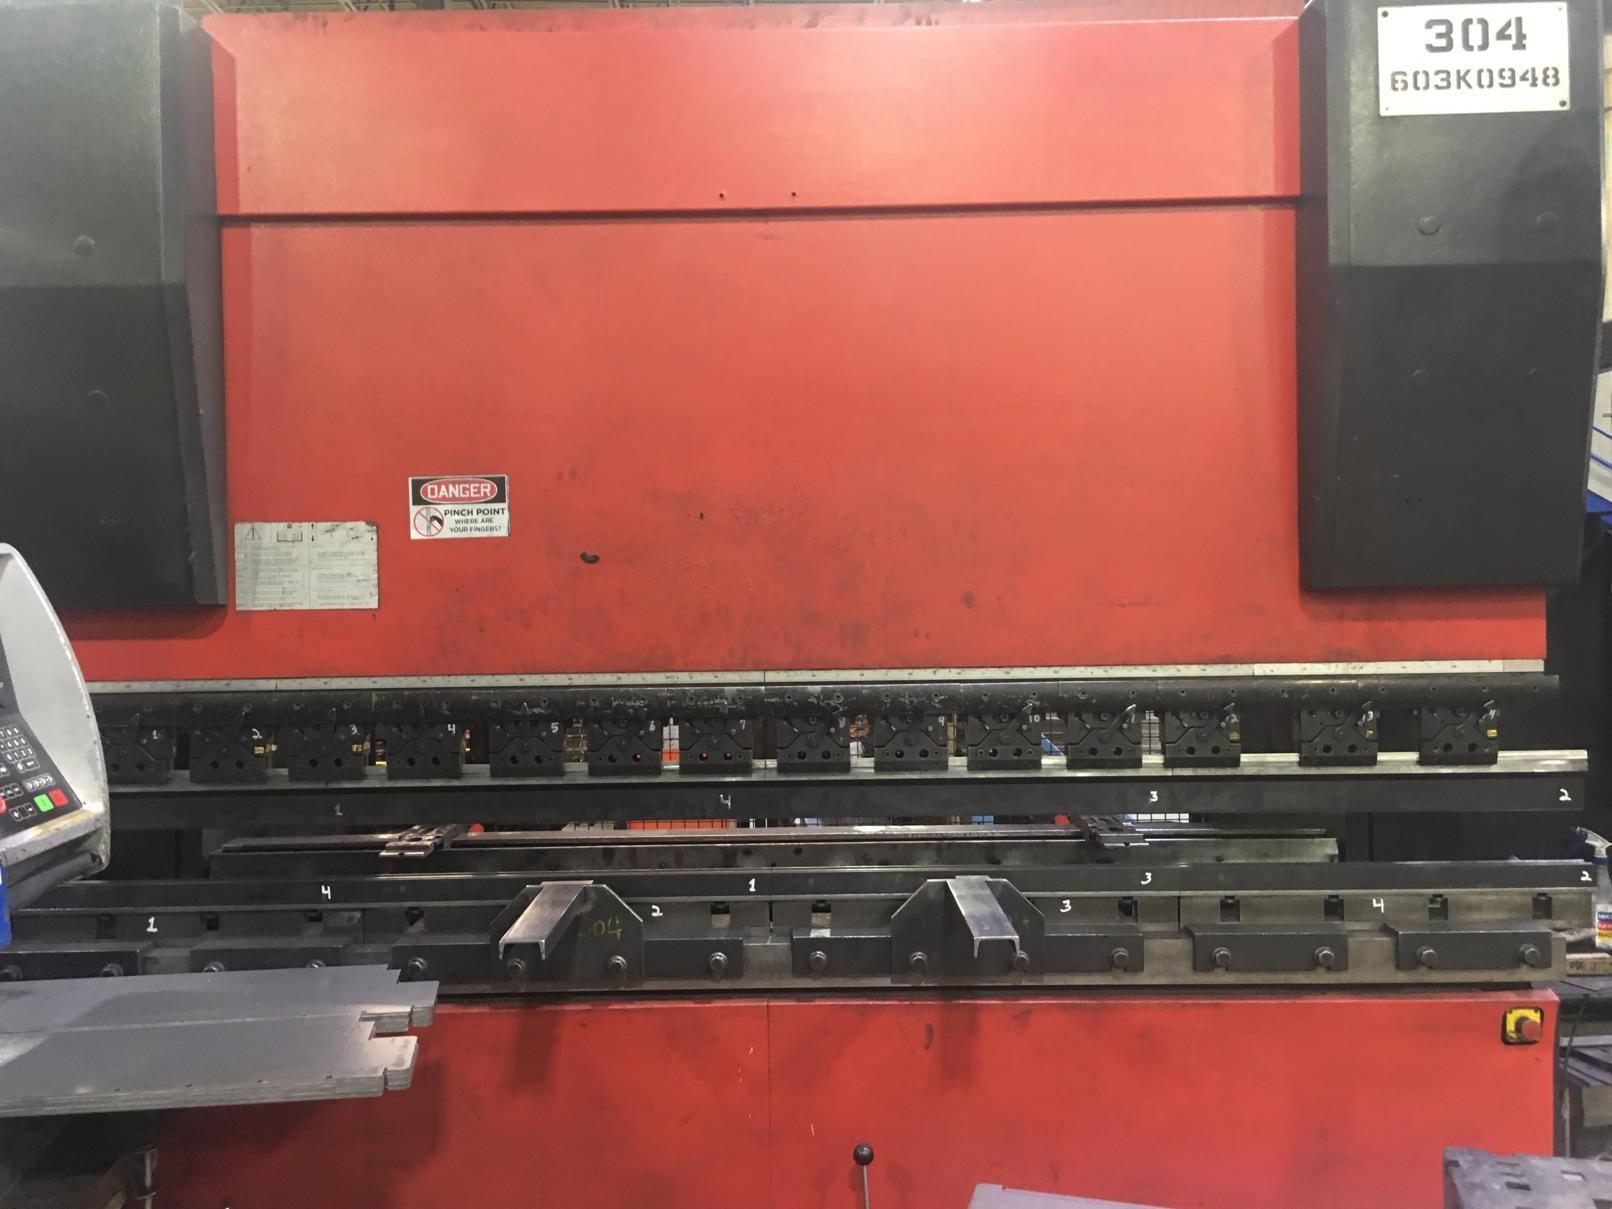 USED AMADA 187 TON X 10' MODEL HFE 1703S 6-AXIS HYDRAULIC DOWNACTING CNC PRESS BRAKE, Stock# 10730, Year 2004